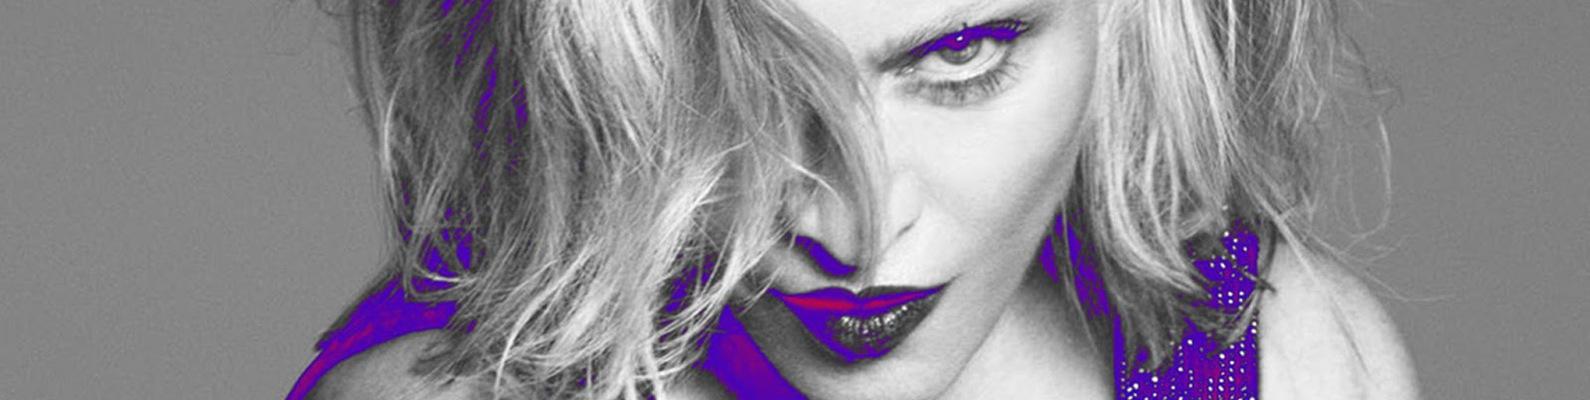 MadonnaBootlegCollection | ВКонтакте